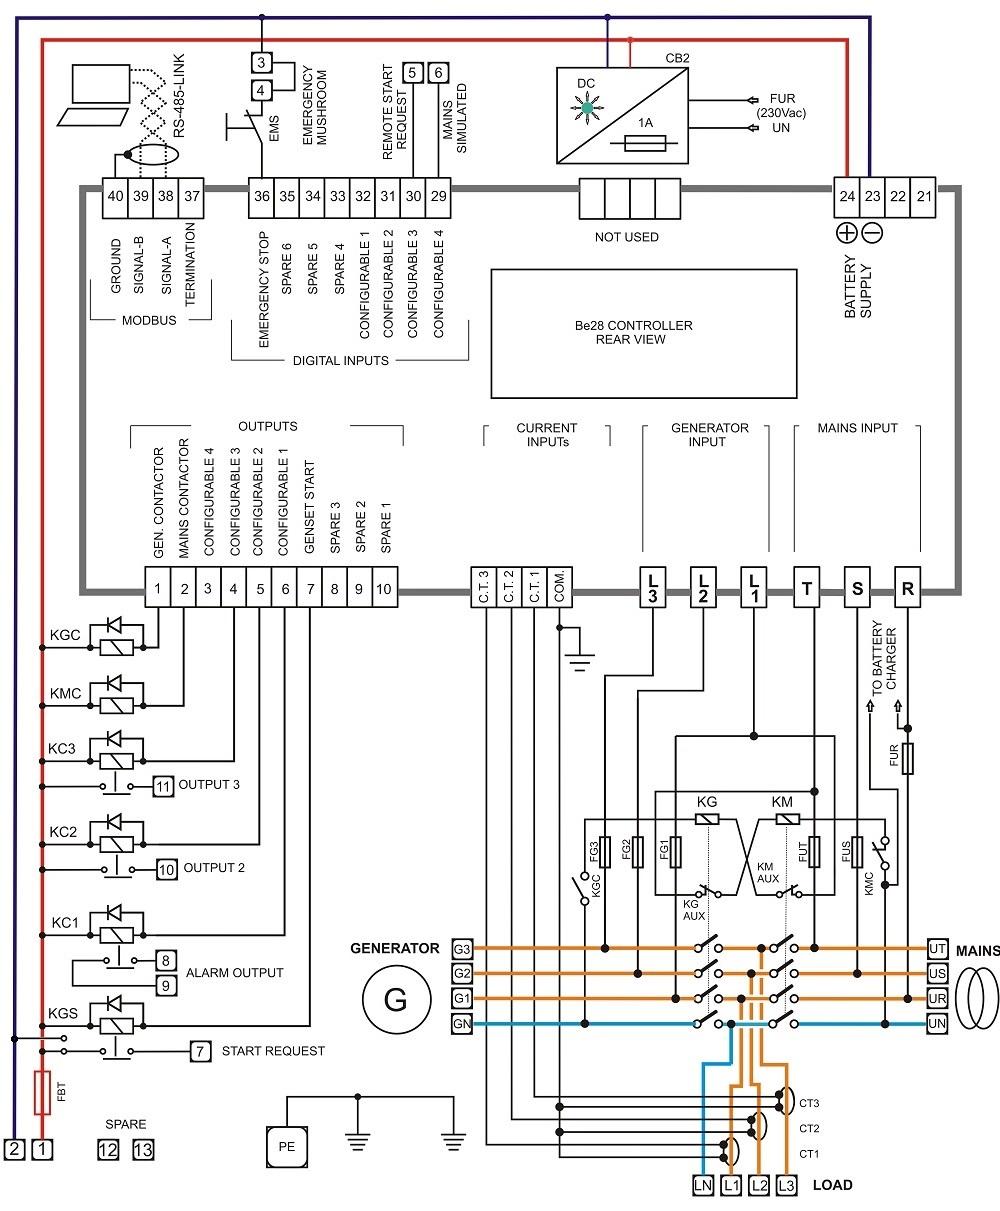 citroen c5 x7 wiring diagram citroen c5 wiring diagram car trailer lights wiring  diagram industrial wiring